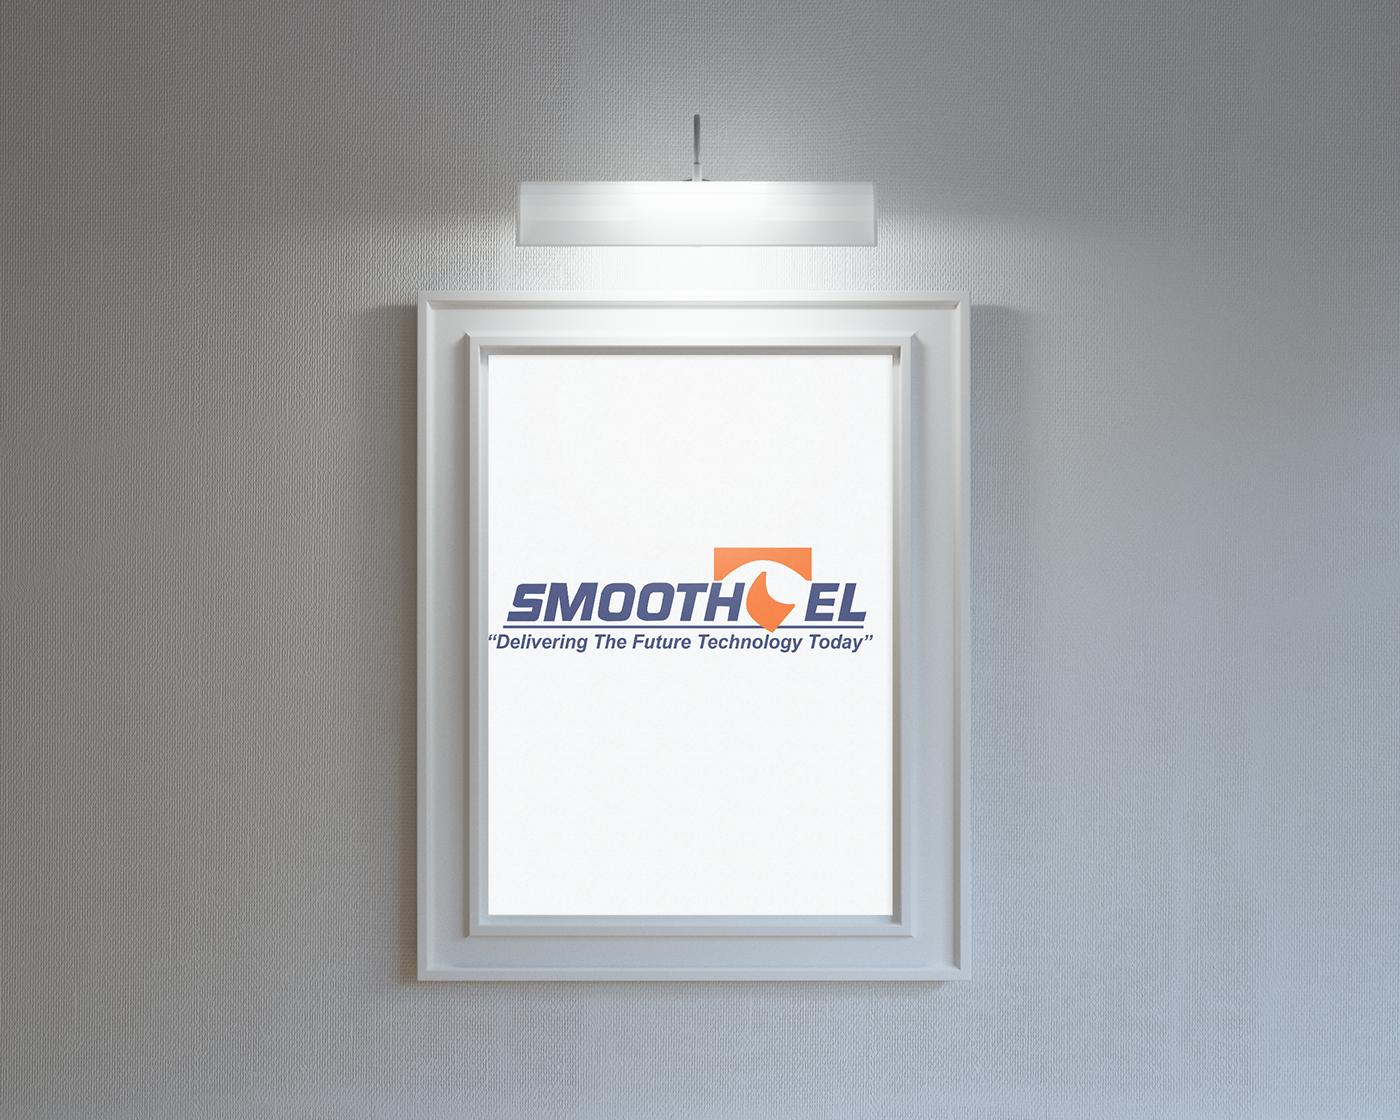 logo branding  graphic design  corporate branding